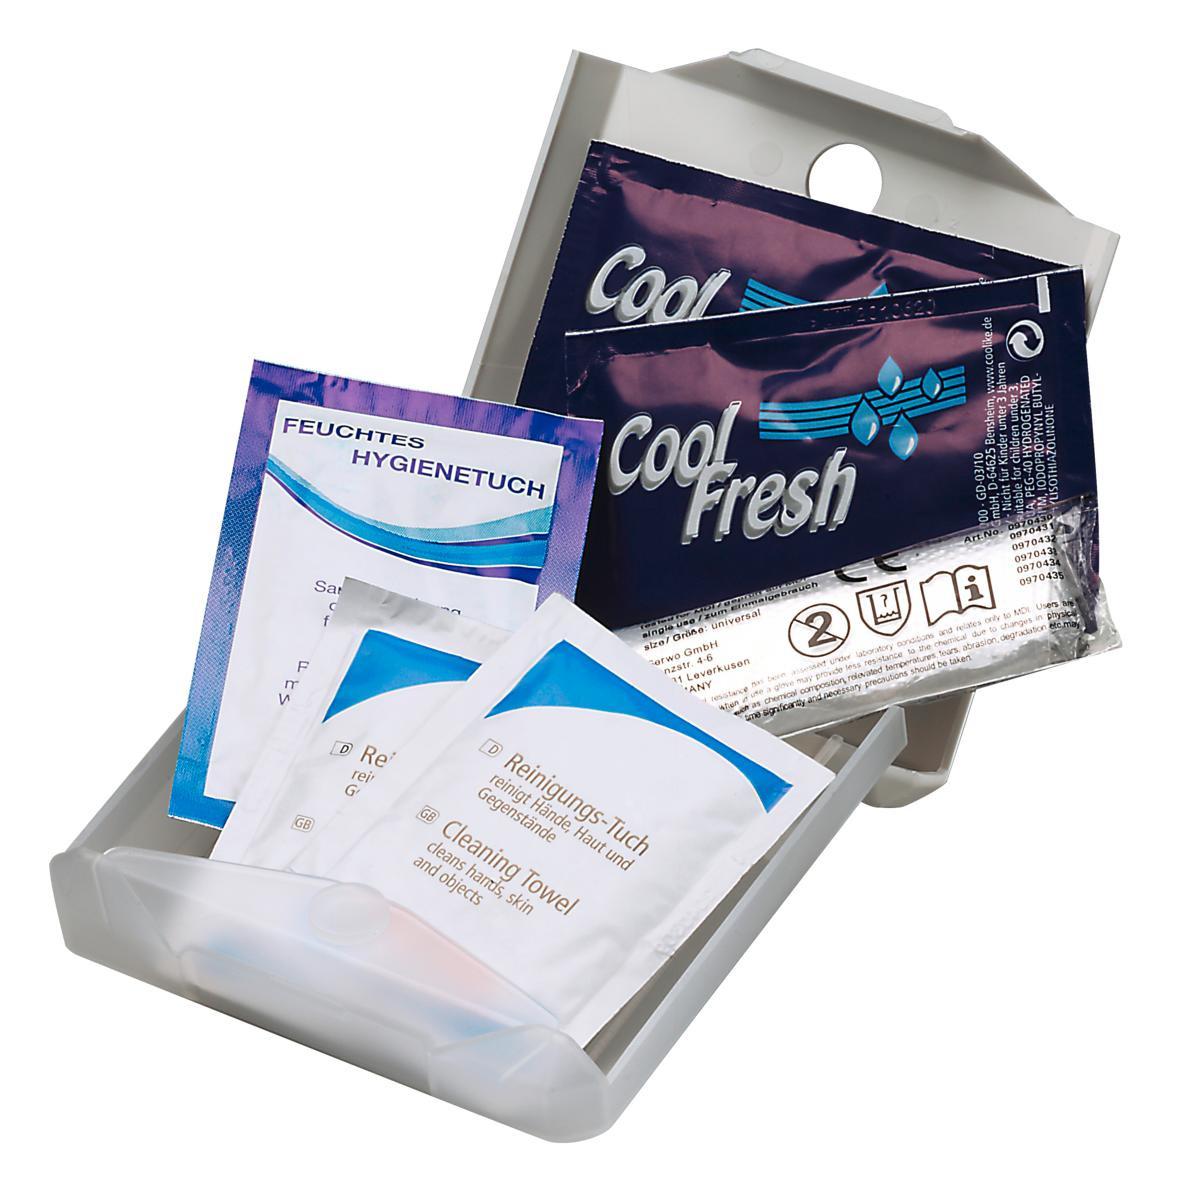 Travelbox Hygiene